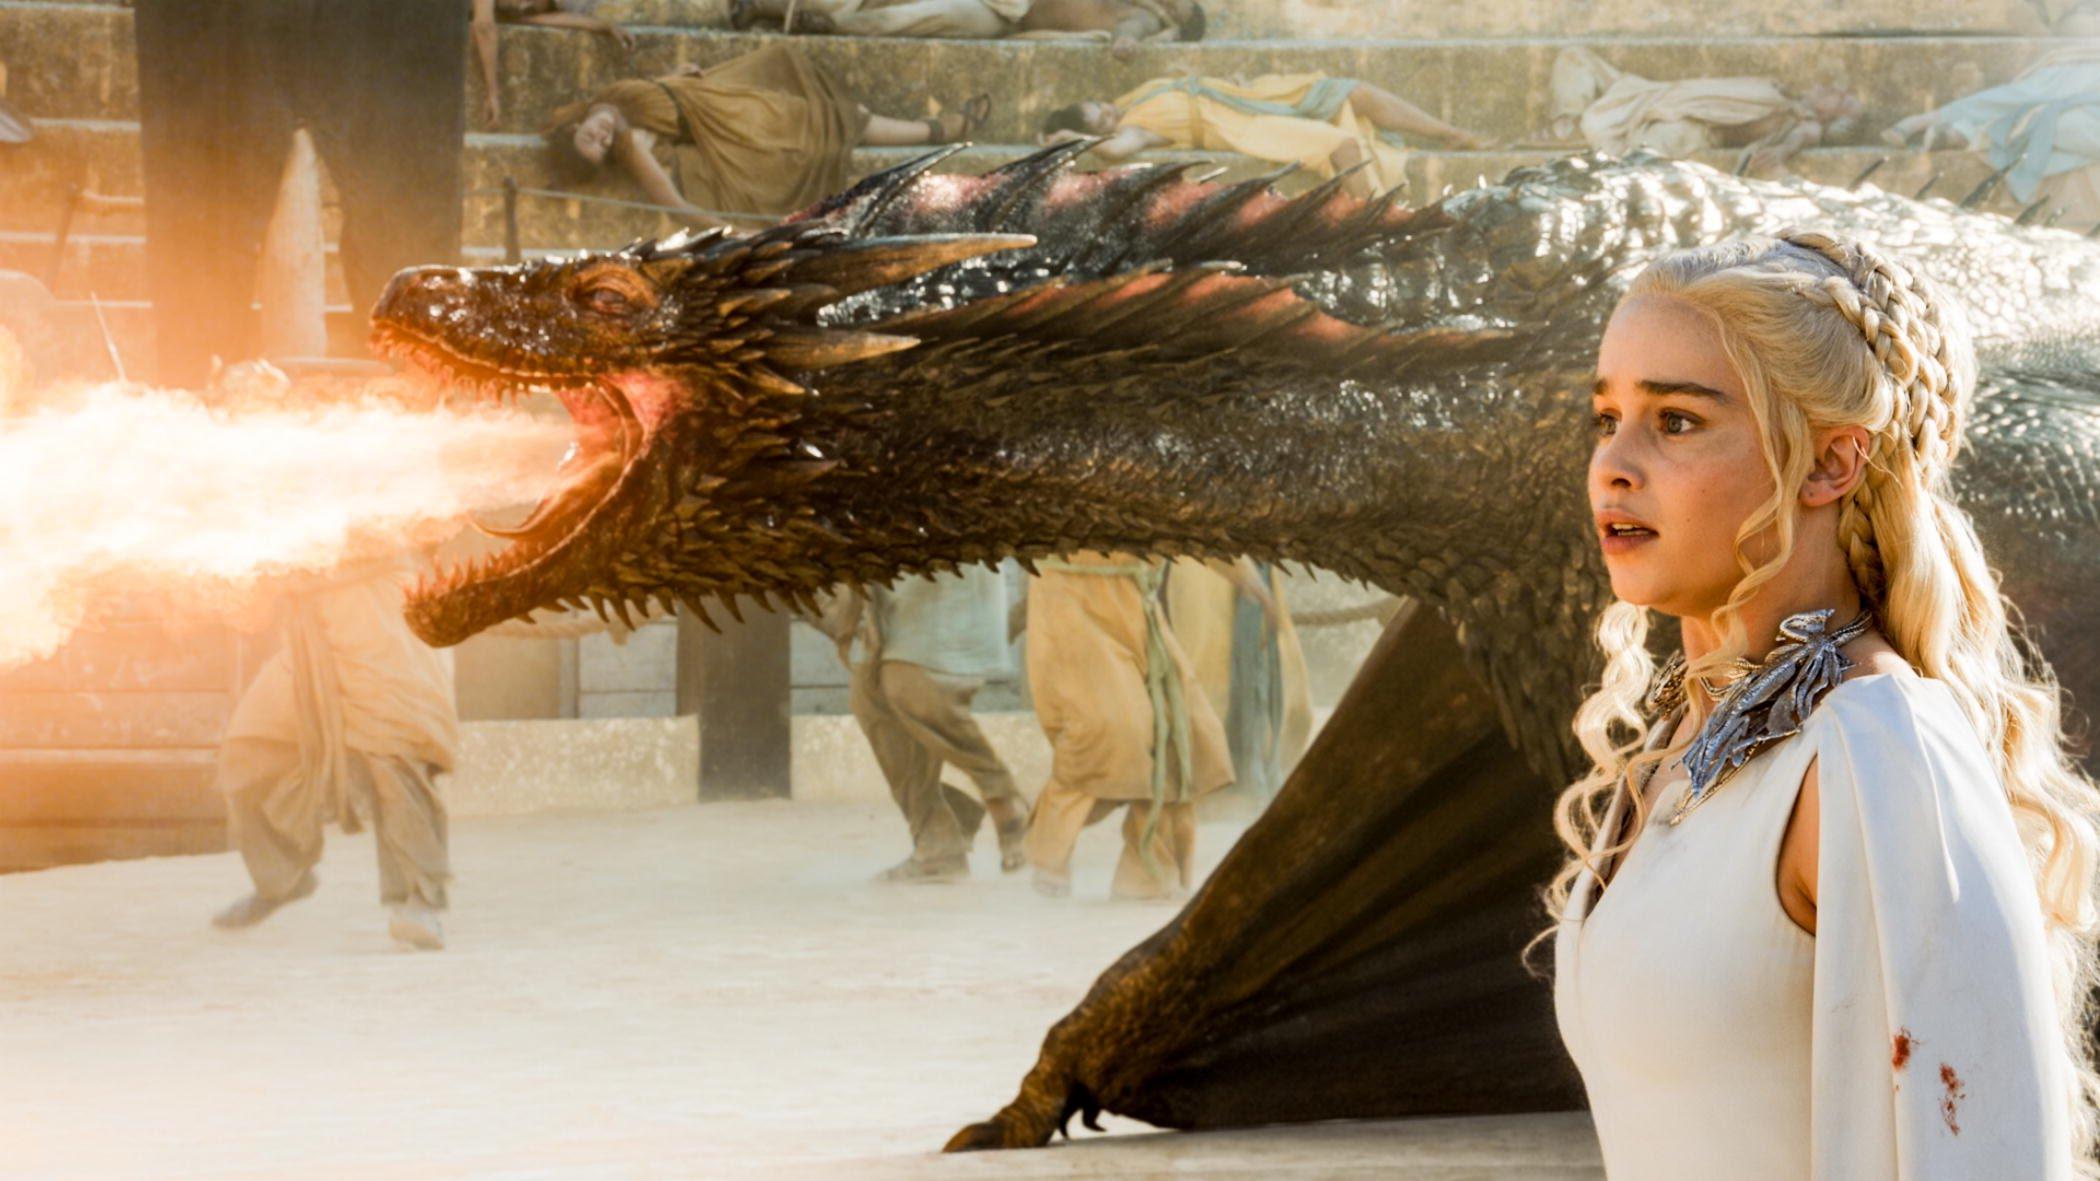 Daenerys Targaryen and dragon